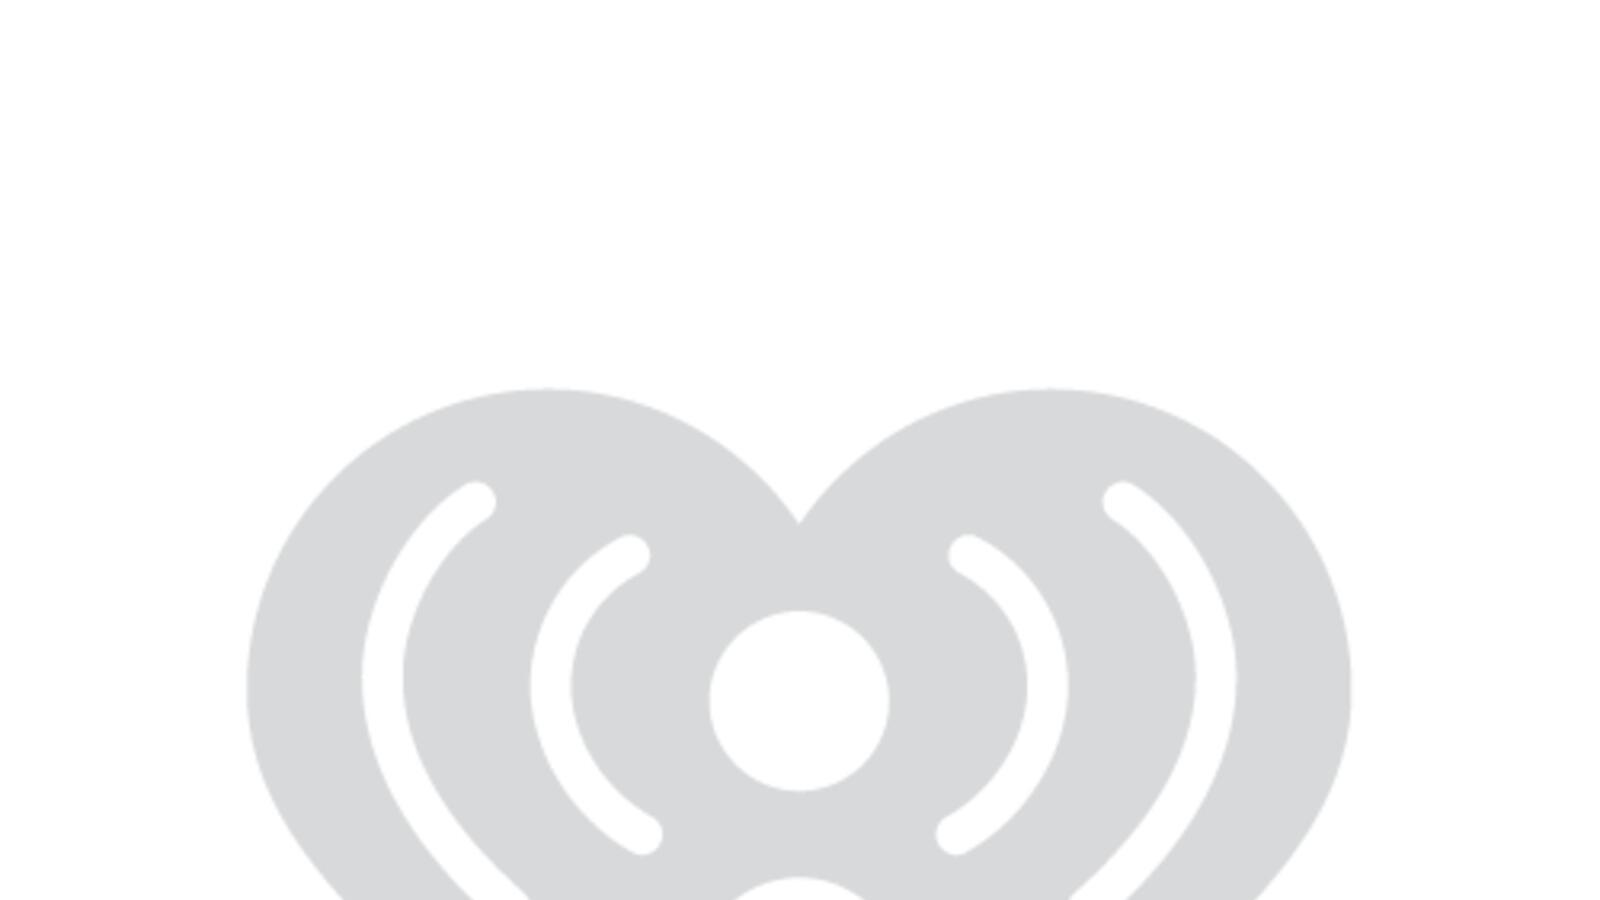 Deputy Killed, 2 Others Injured In Houston Nightclub Shooting